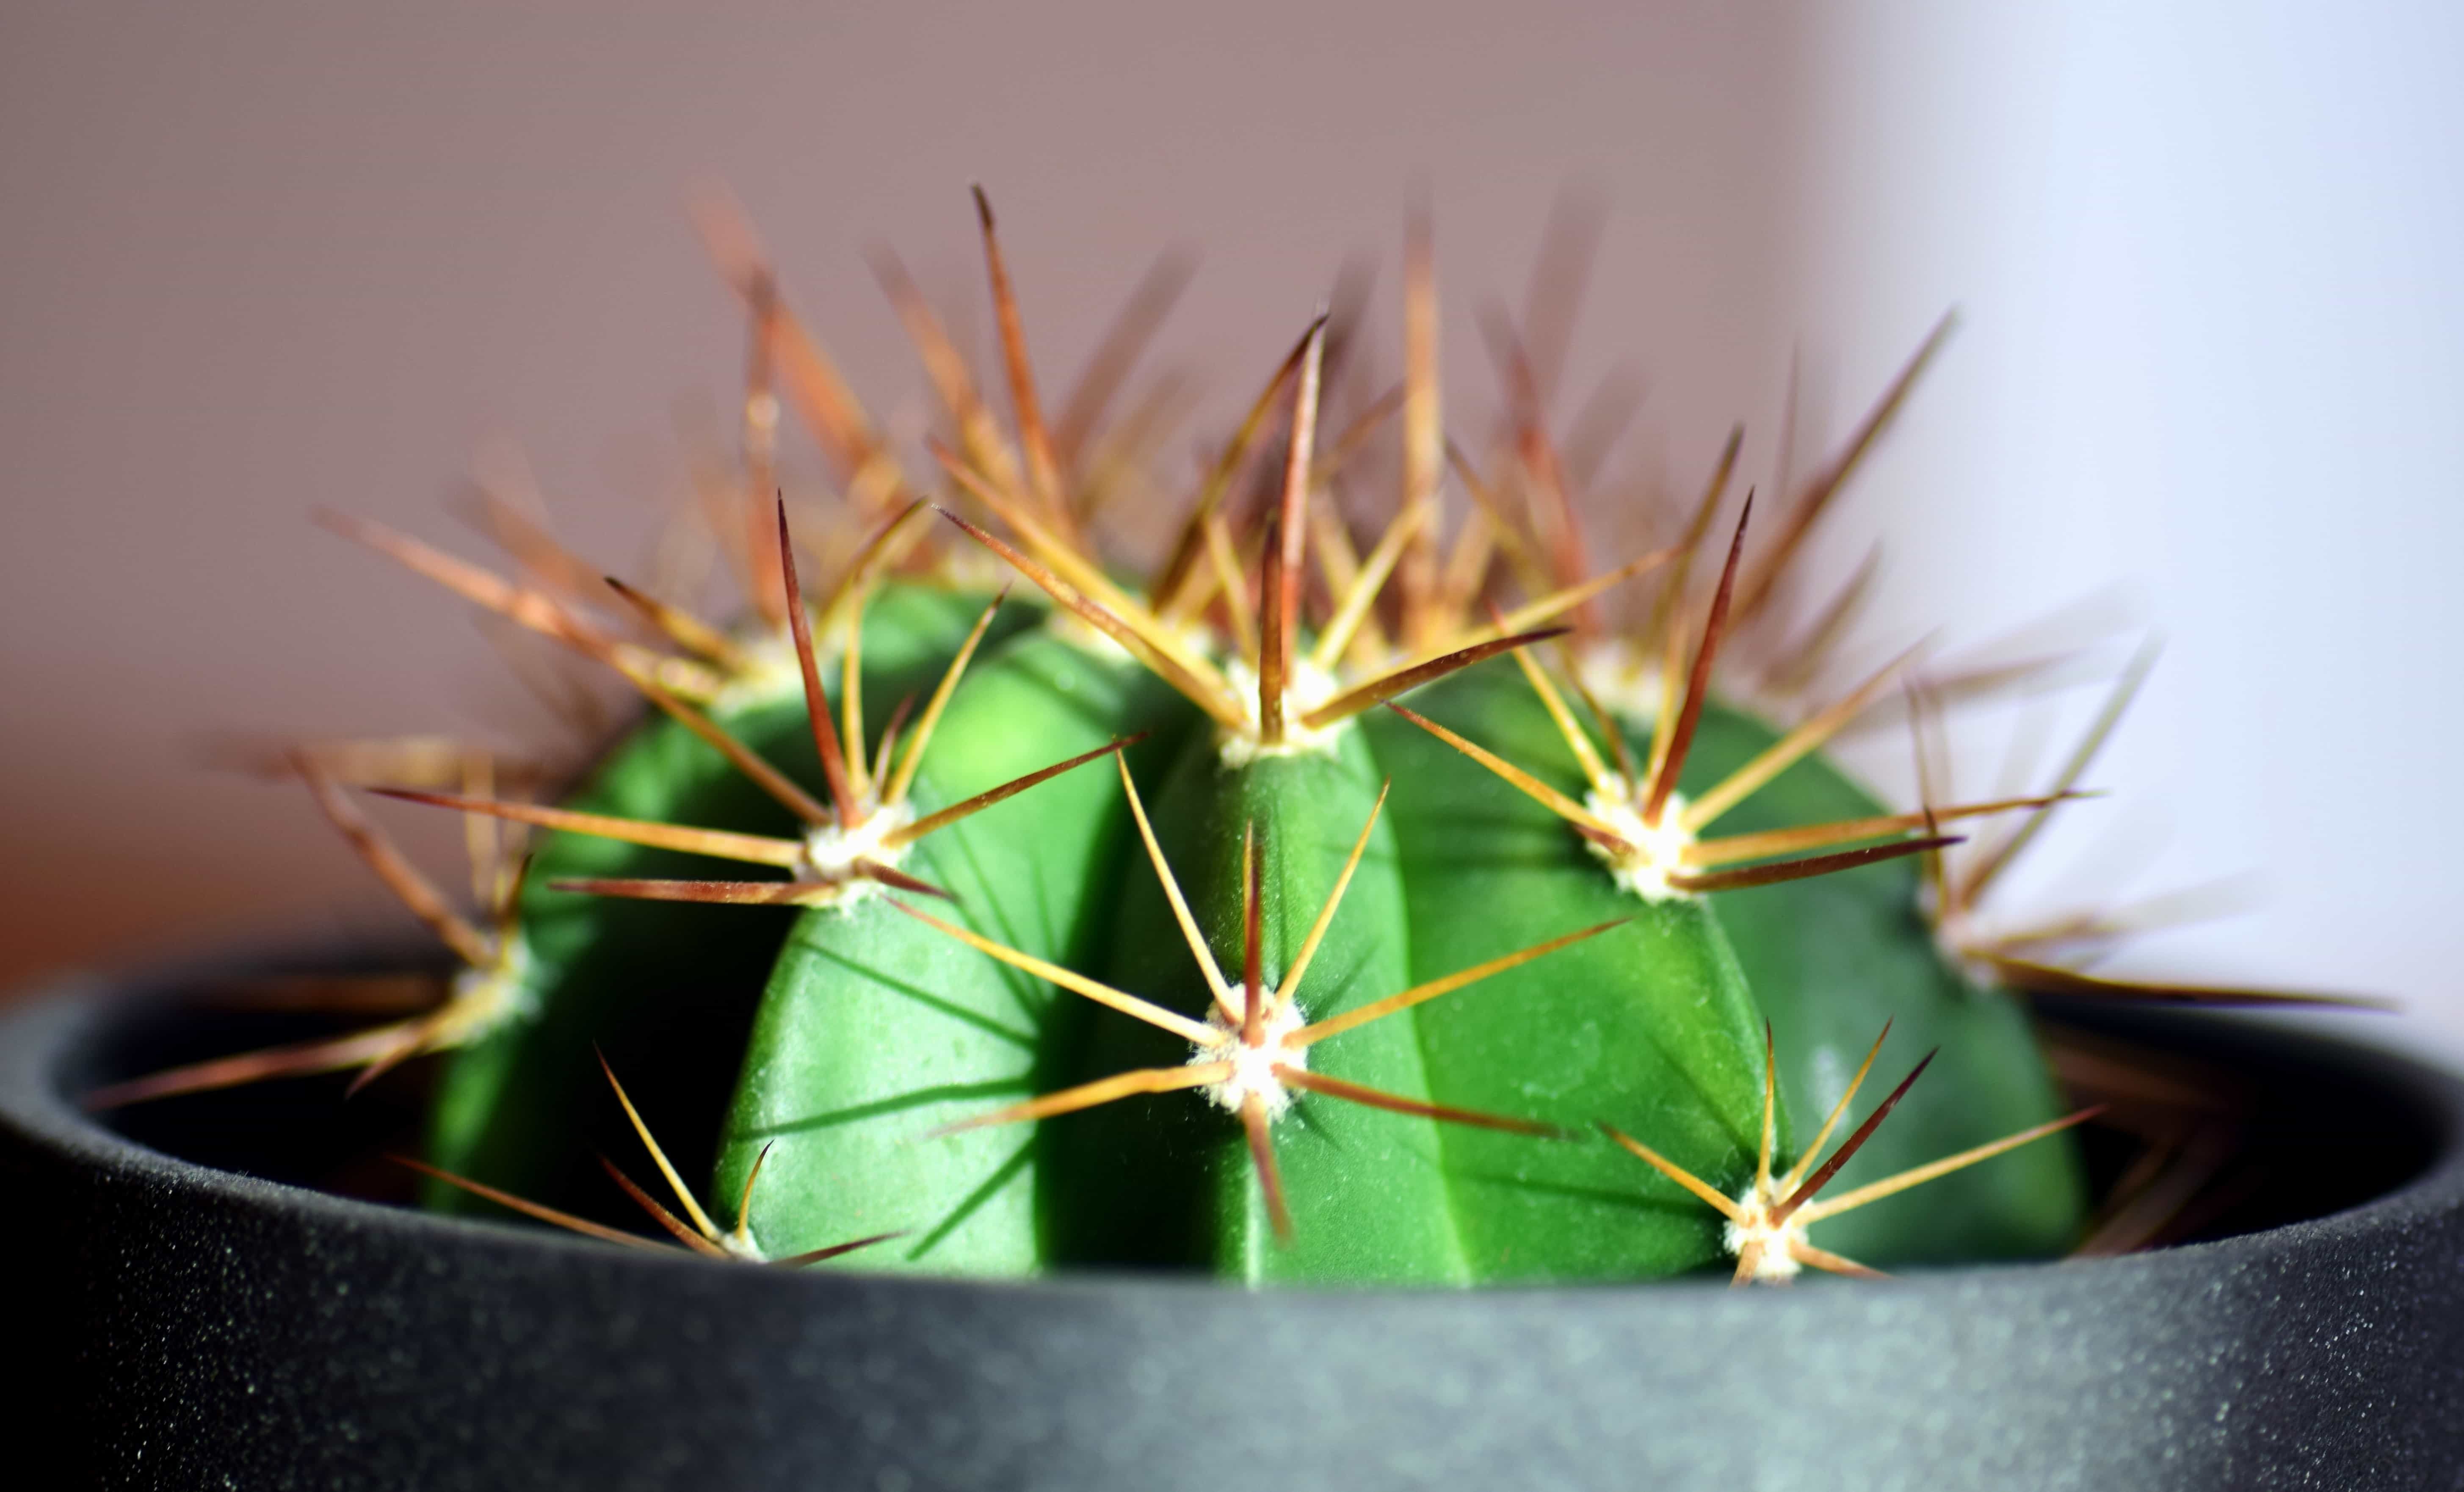 Free Picture  Cactus  Spike  Sharp  Nature  Macro  Flower